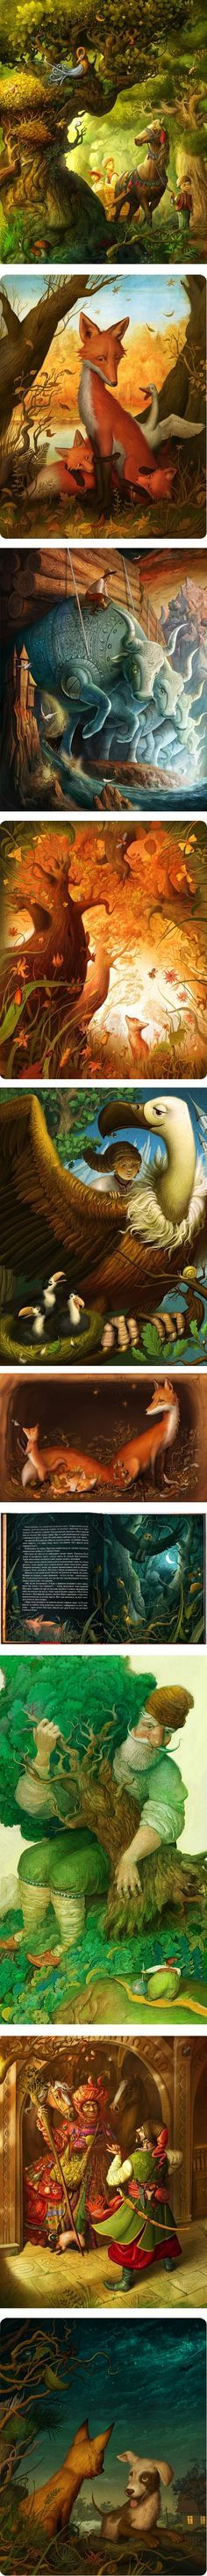 Ivan Sulima. Ivan Sulima is a Ukrainian illustrator who focuses on children's book illustration.